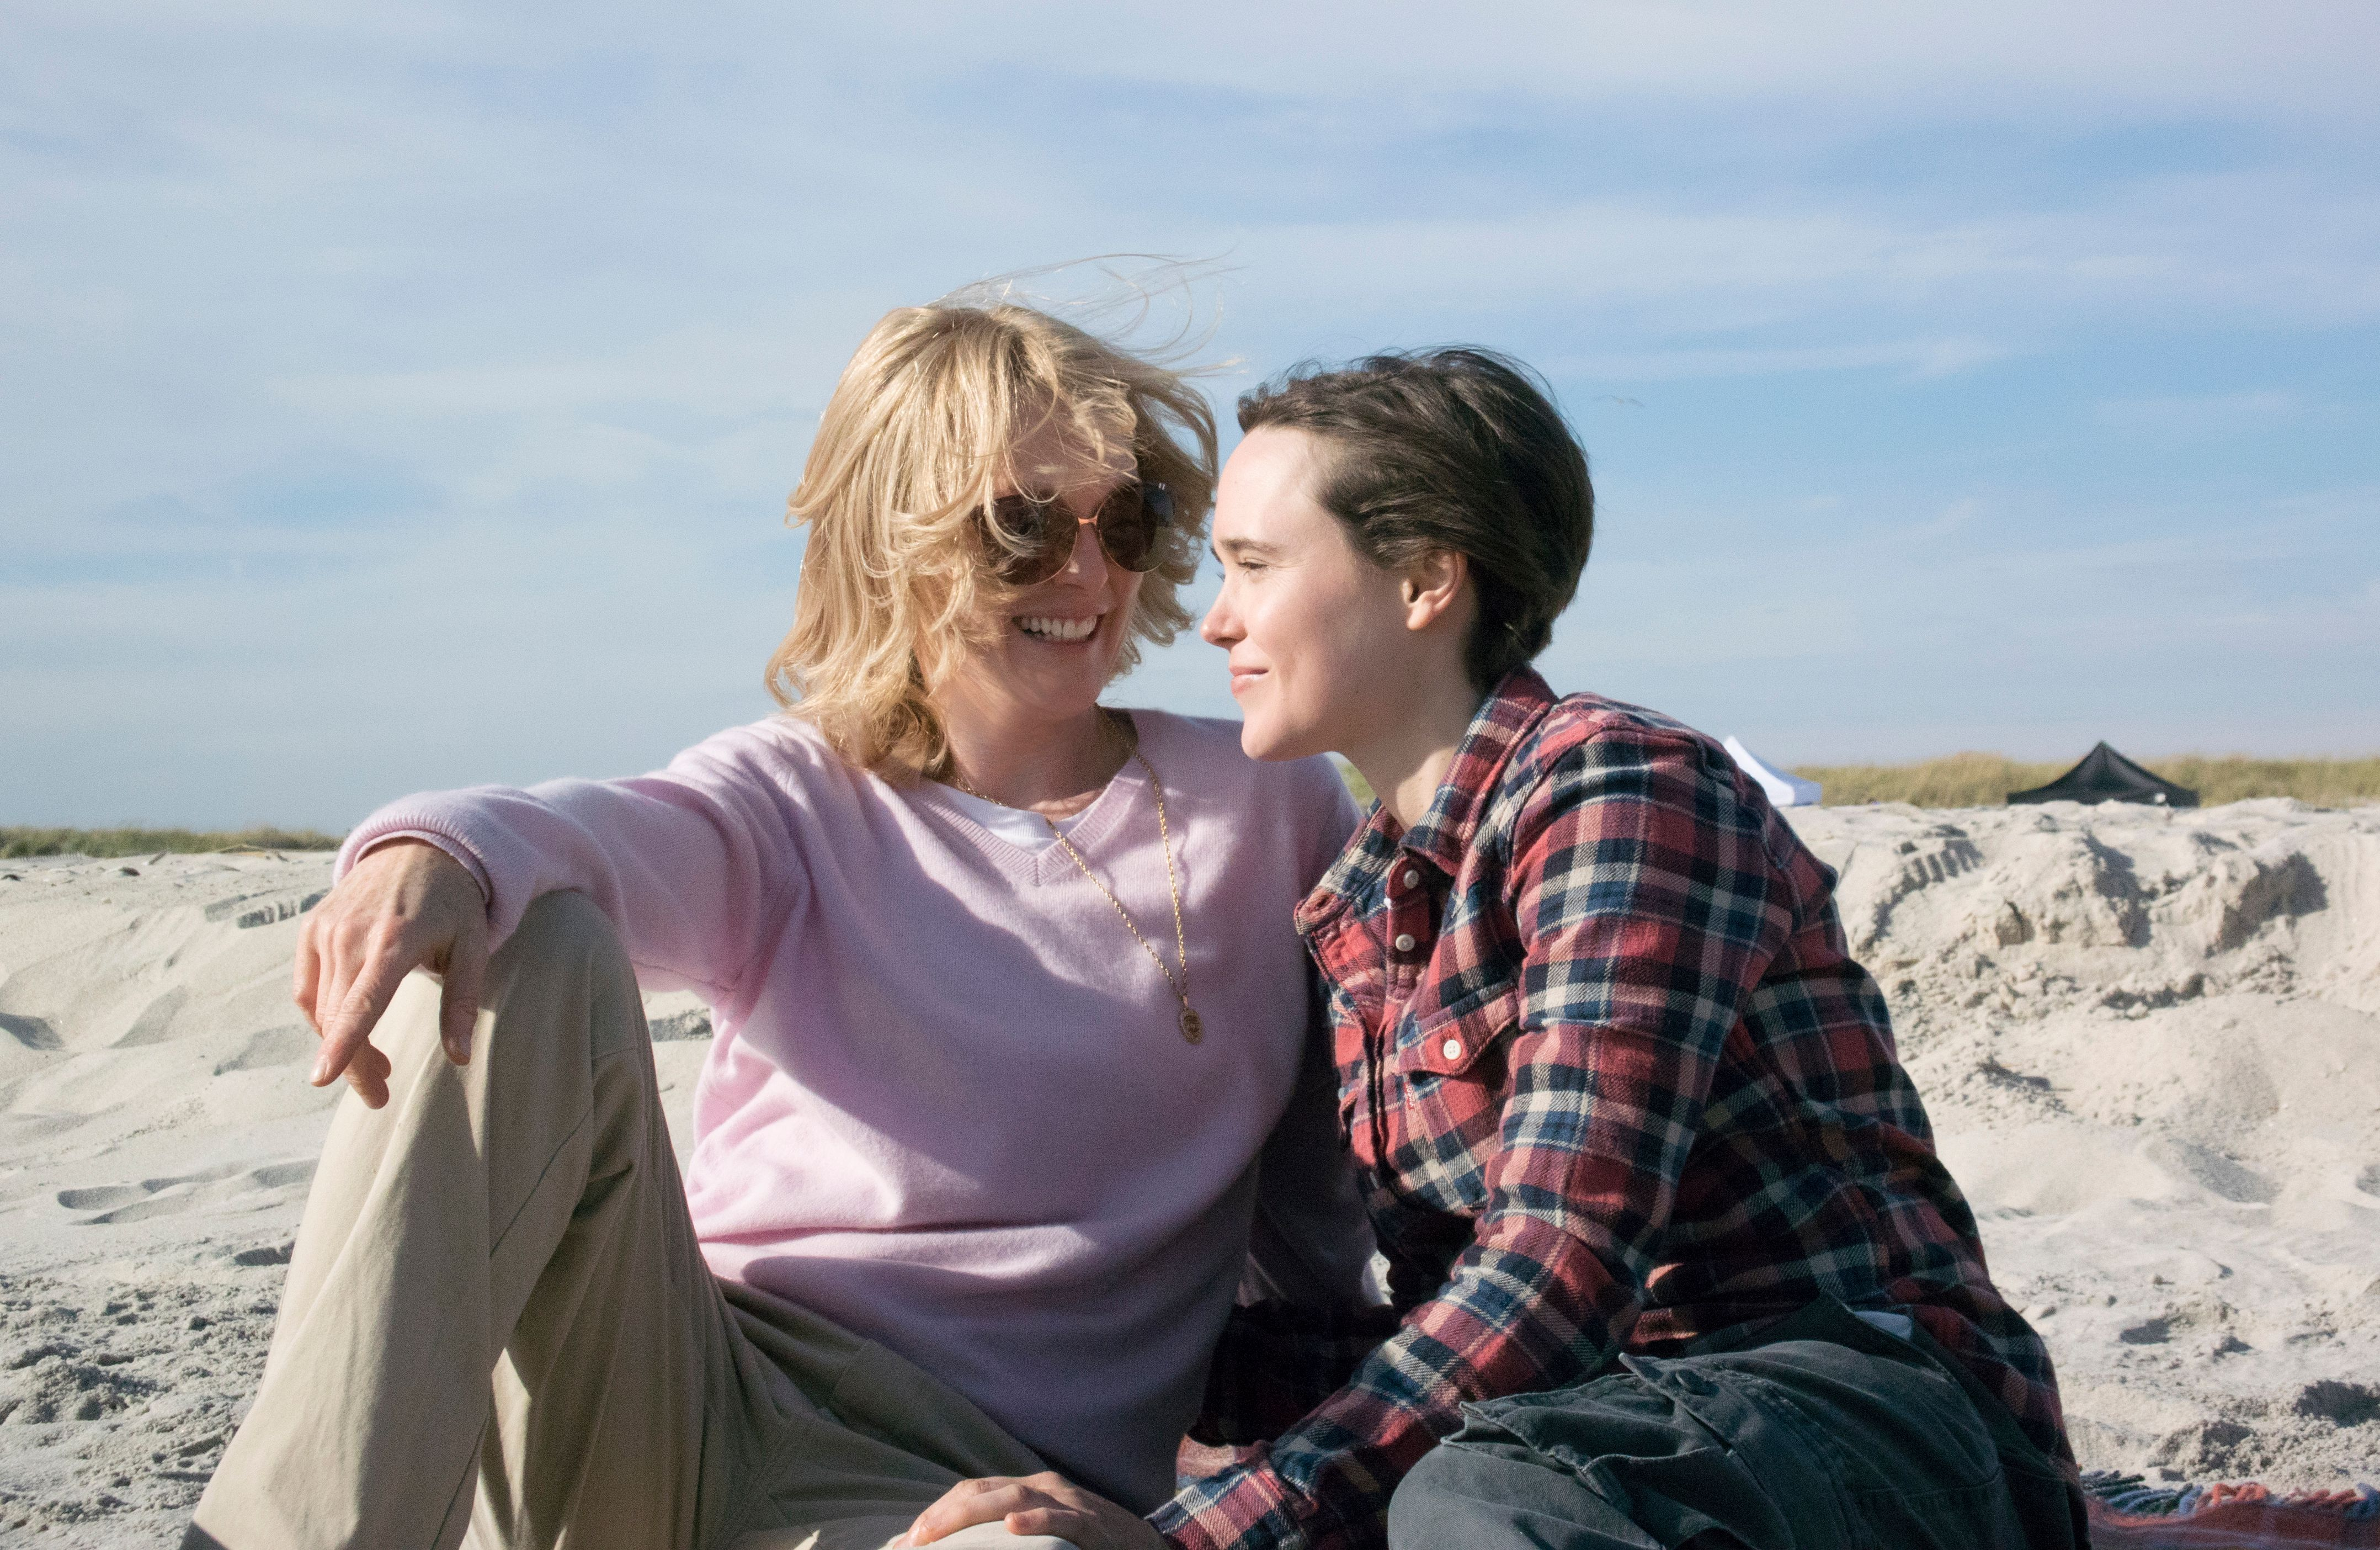 freeheld trailer starring ellen page and julianne moore